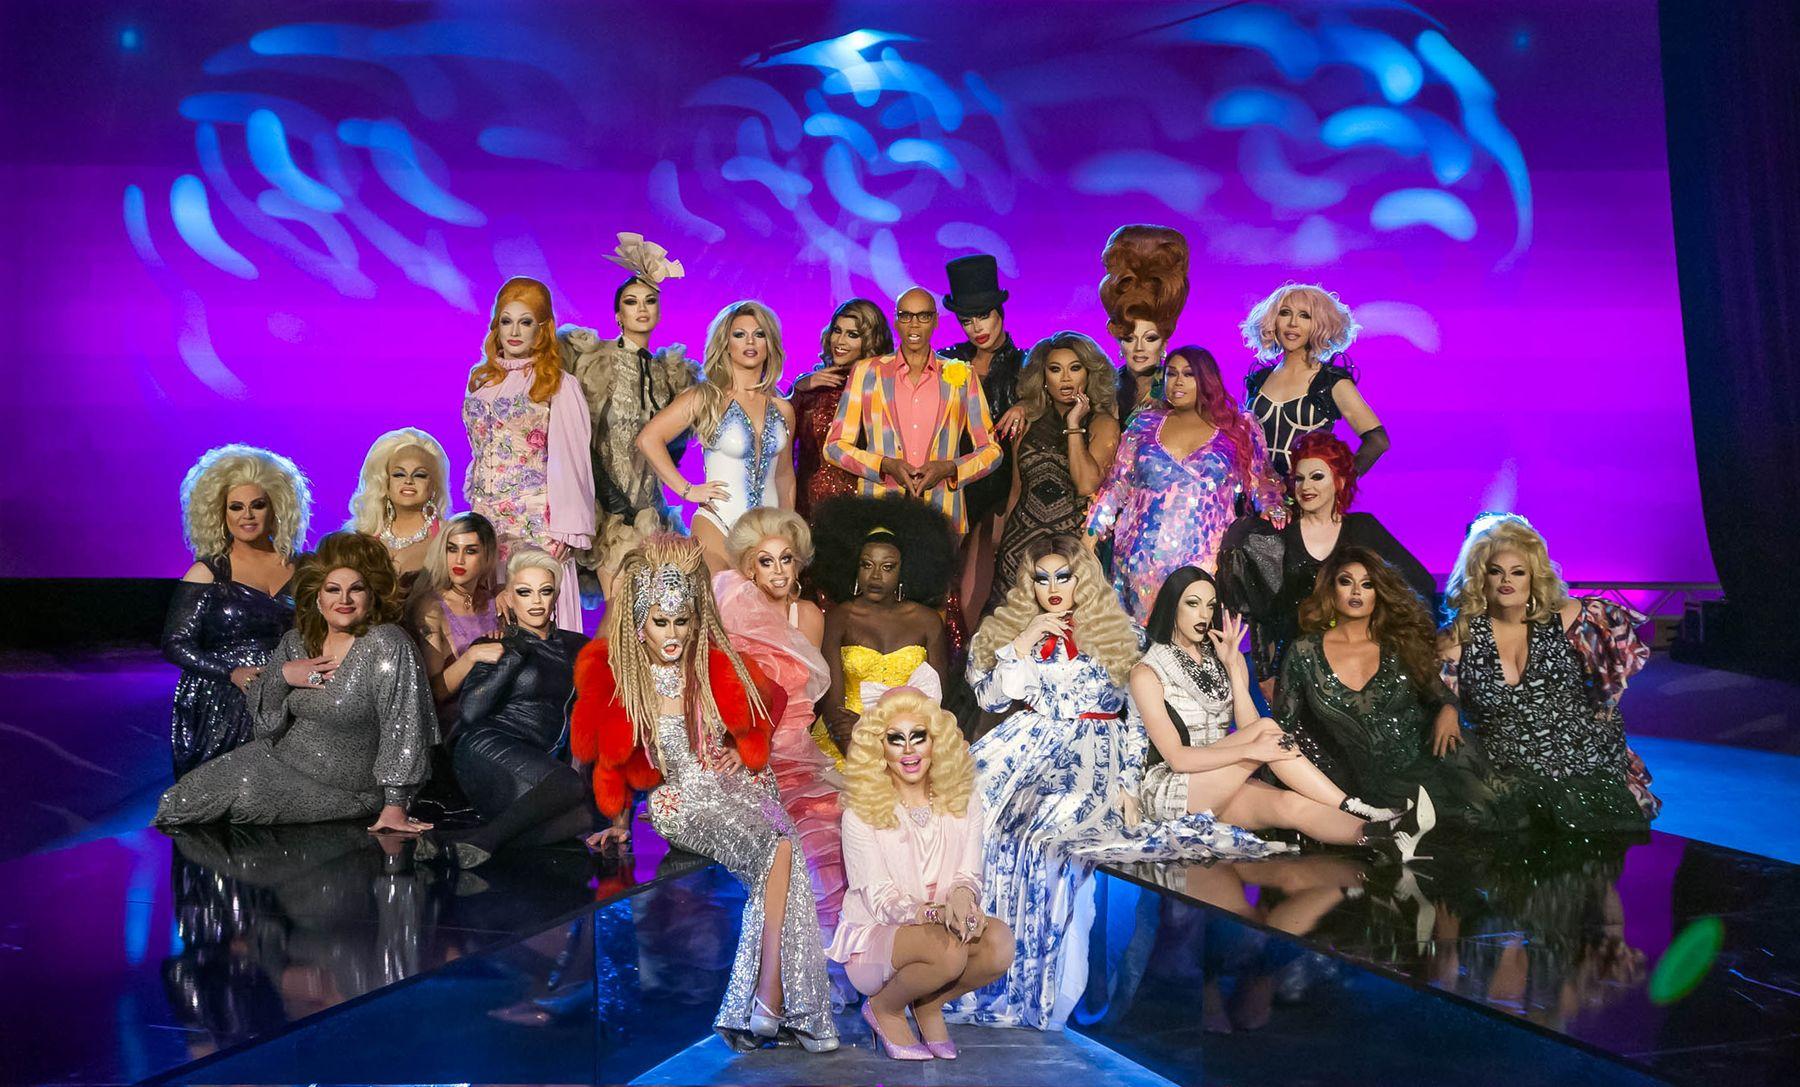 RuPaul's Drag Race Saison 10 Queens